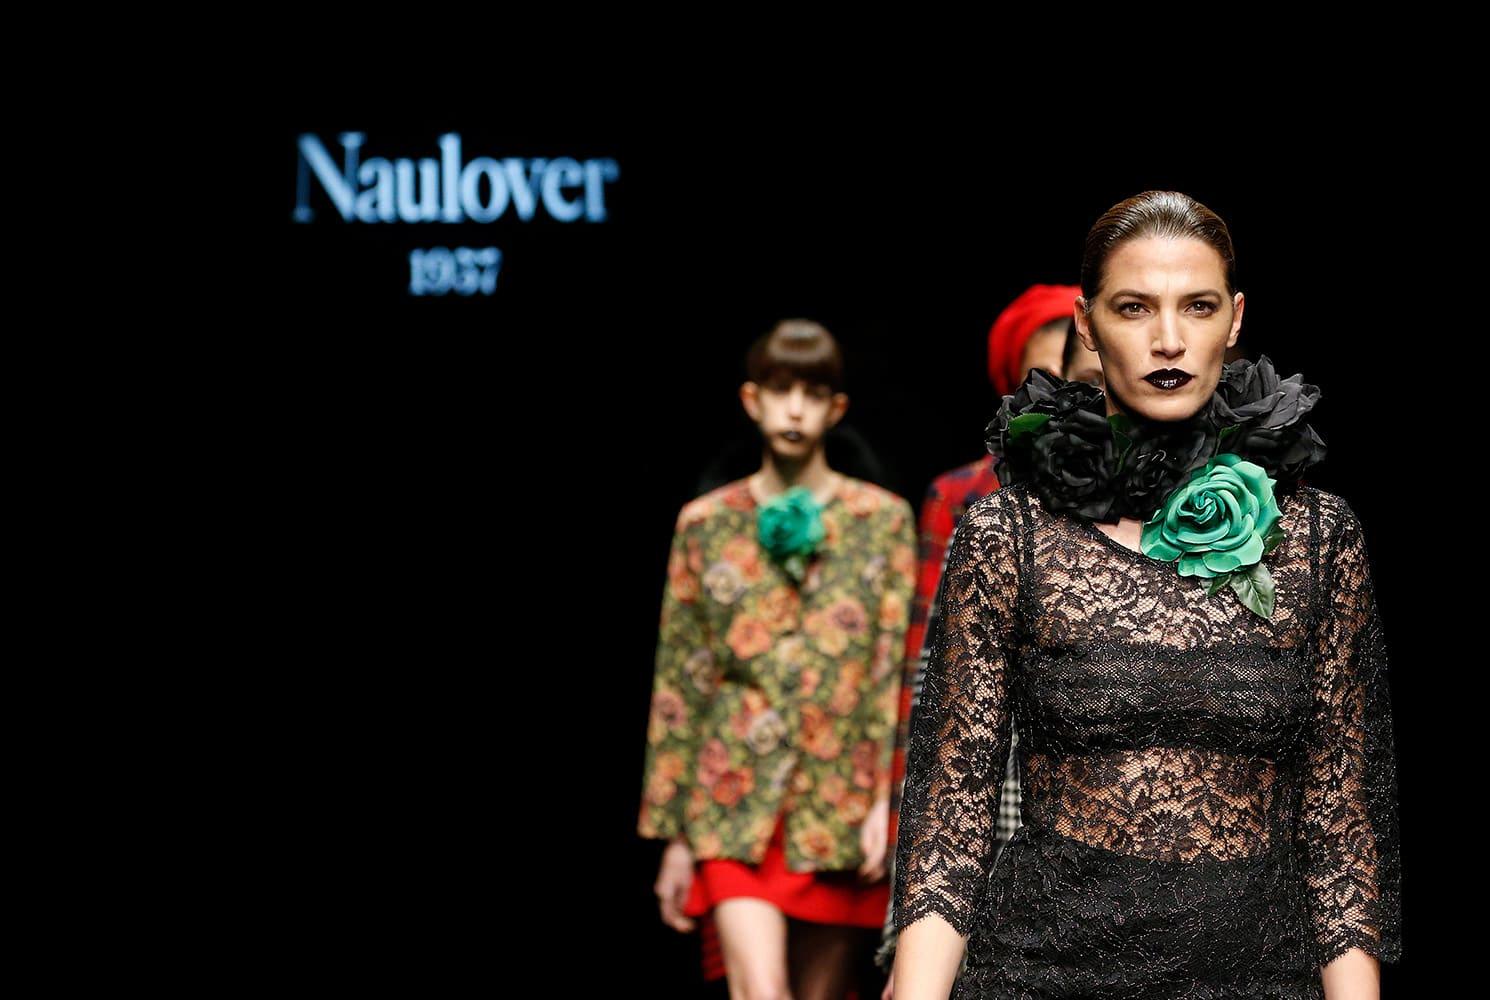 Naulover-11833